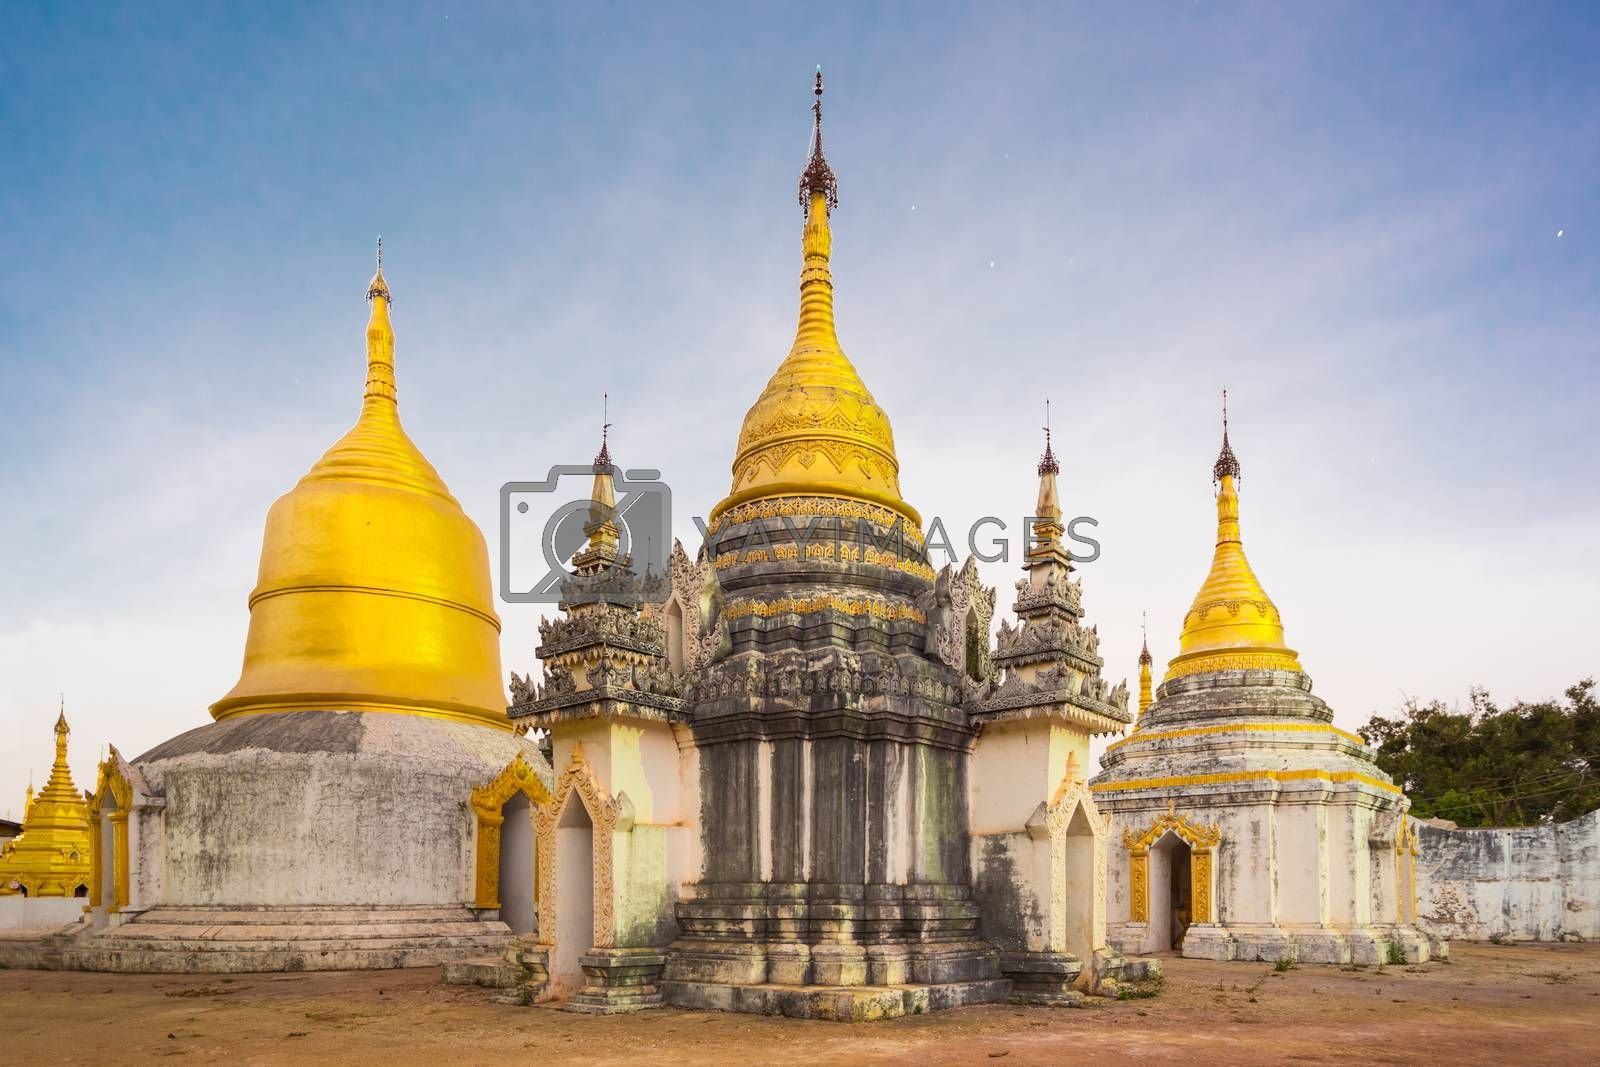 Royalty free image of Ancient buddhist temple, Pindaya, Burma, Myanmar. by kasto